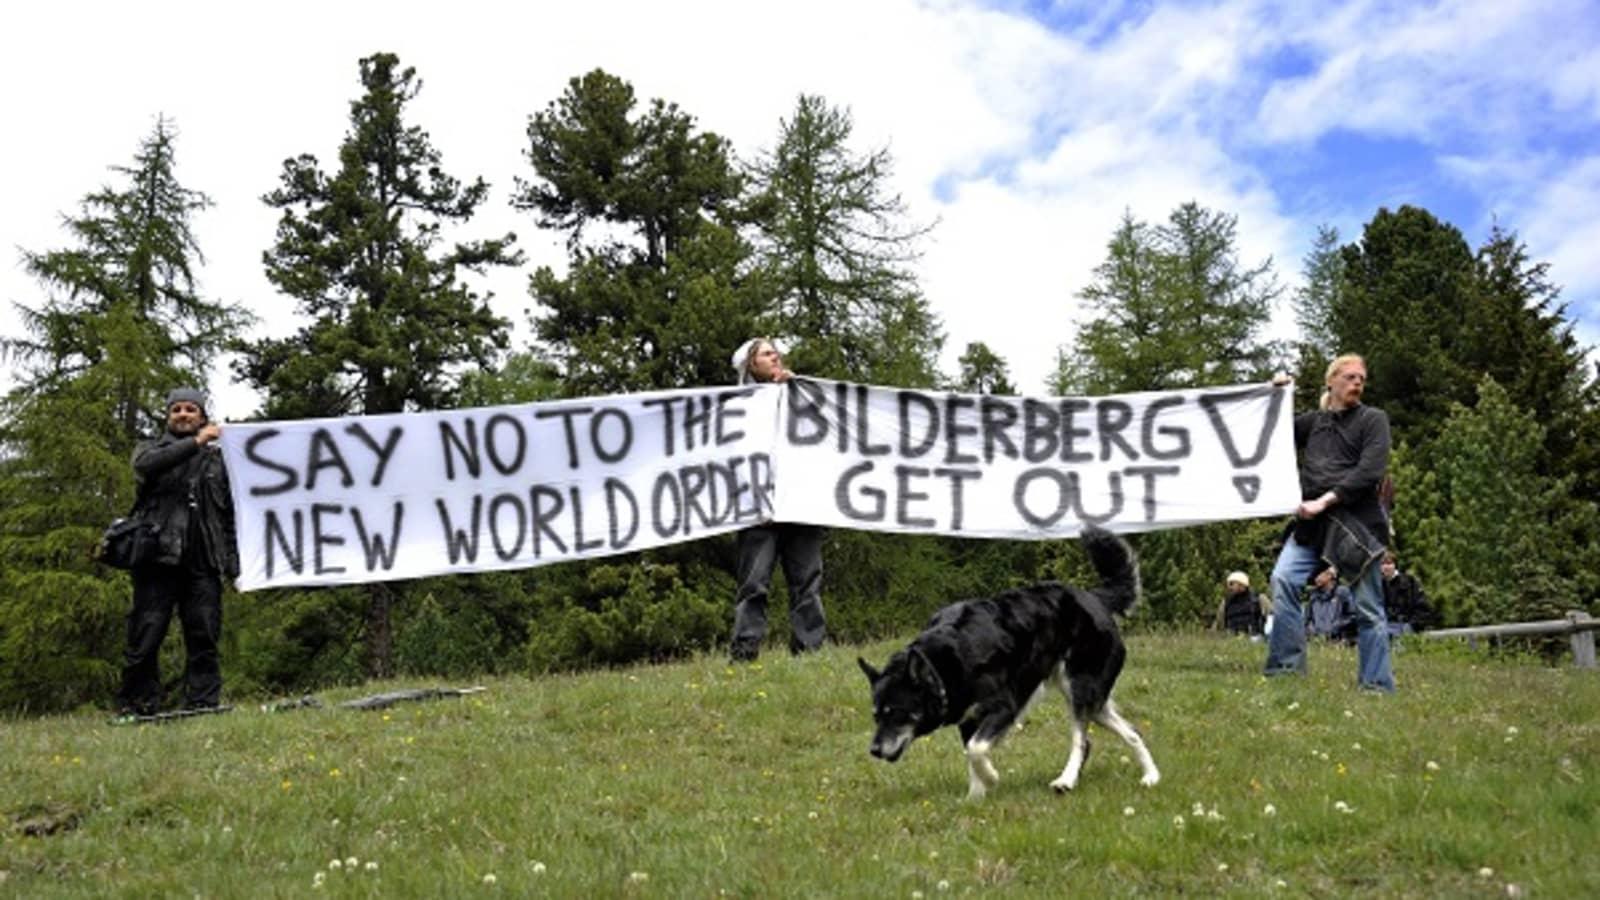 Kushner, Google and Microsoft to attend secret Bilderberg Meeting